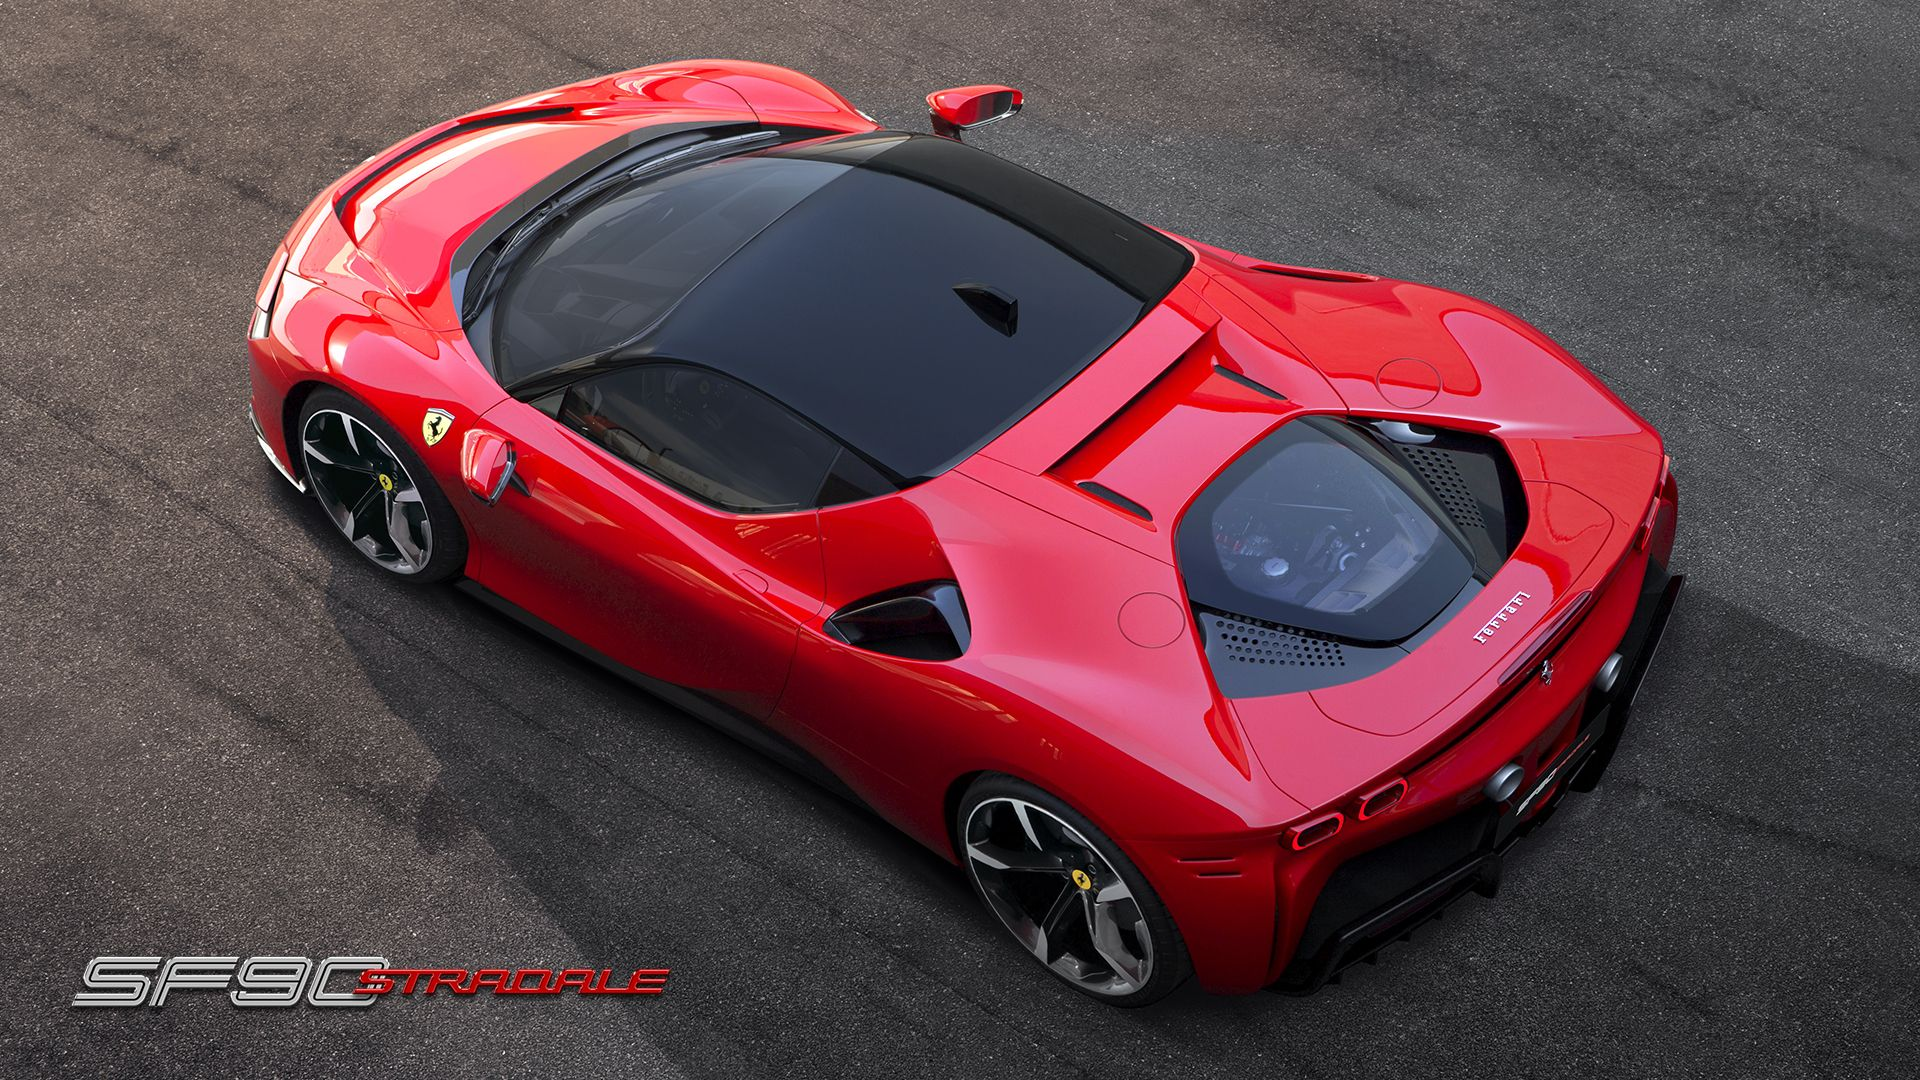 Ferrari Models History Photo Galleries Specs Autoevolution >> Ferrari Sf90 Stradale Specs Photos 2019 Autoevolution